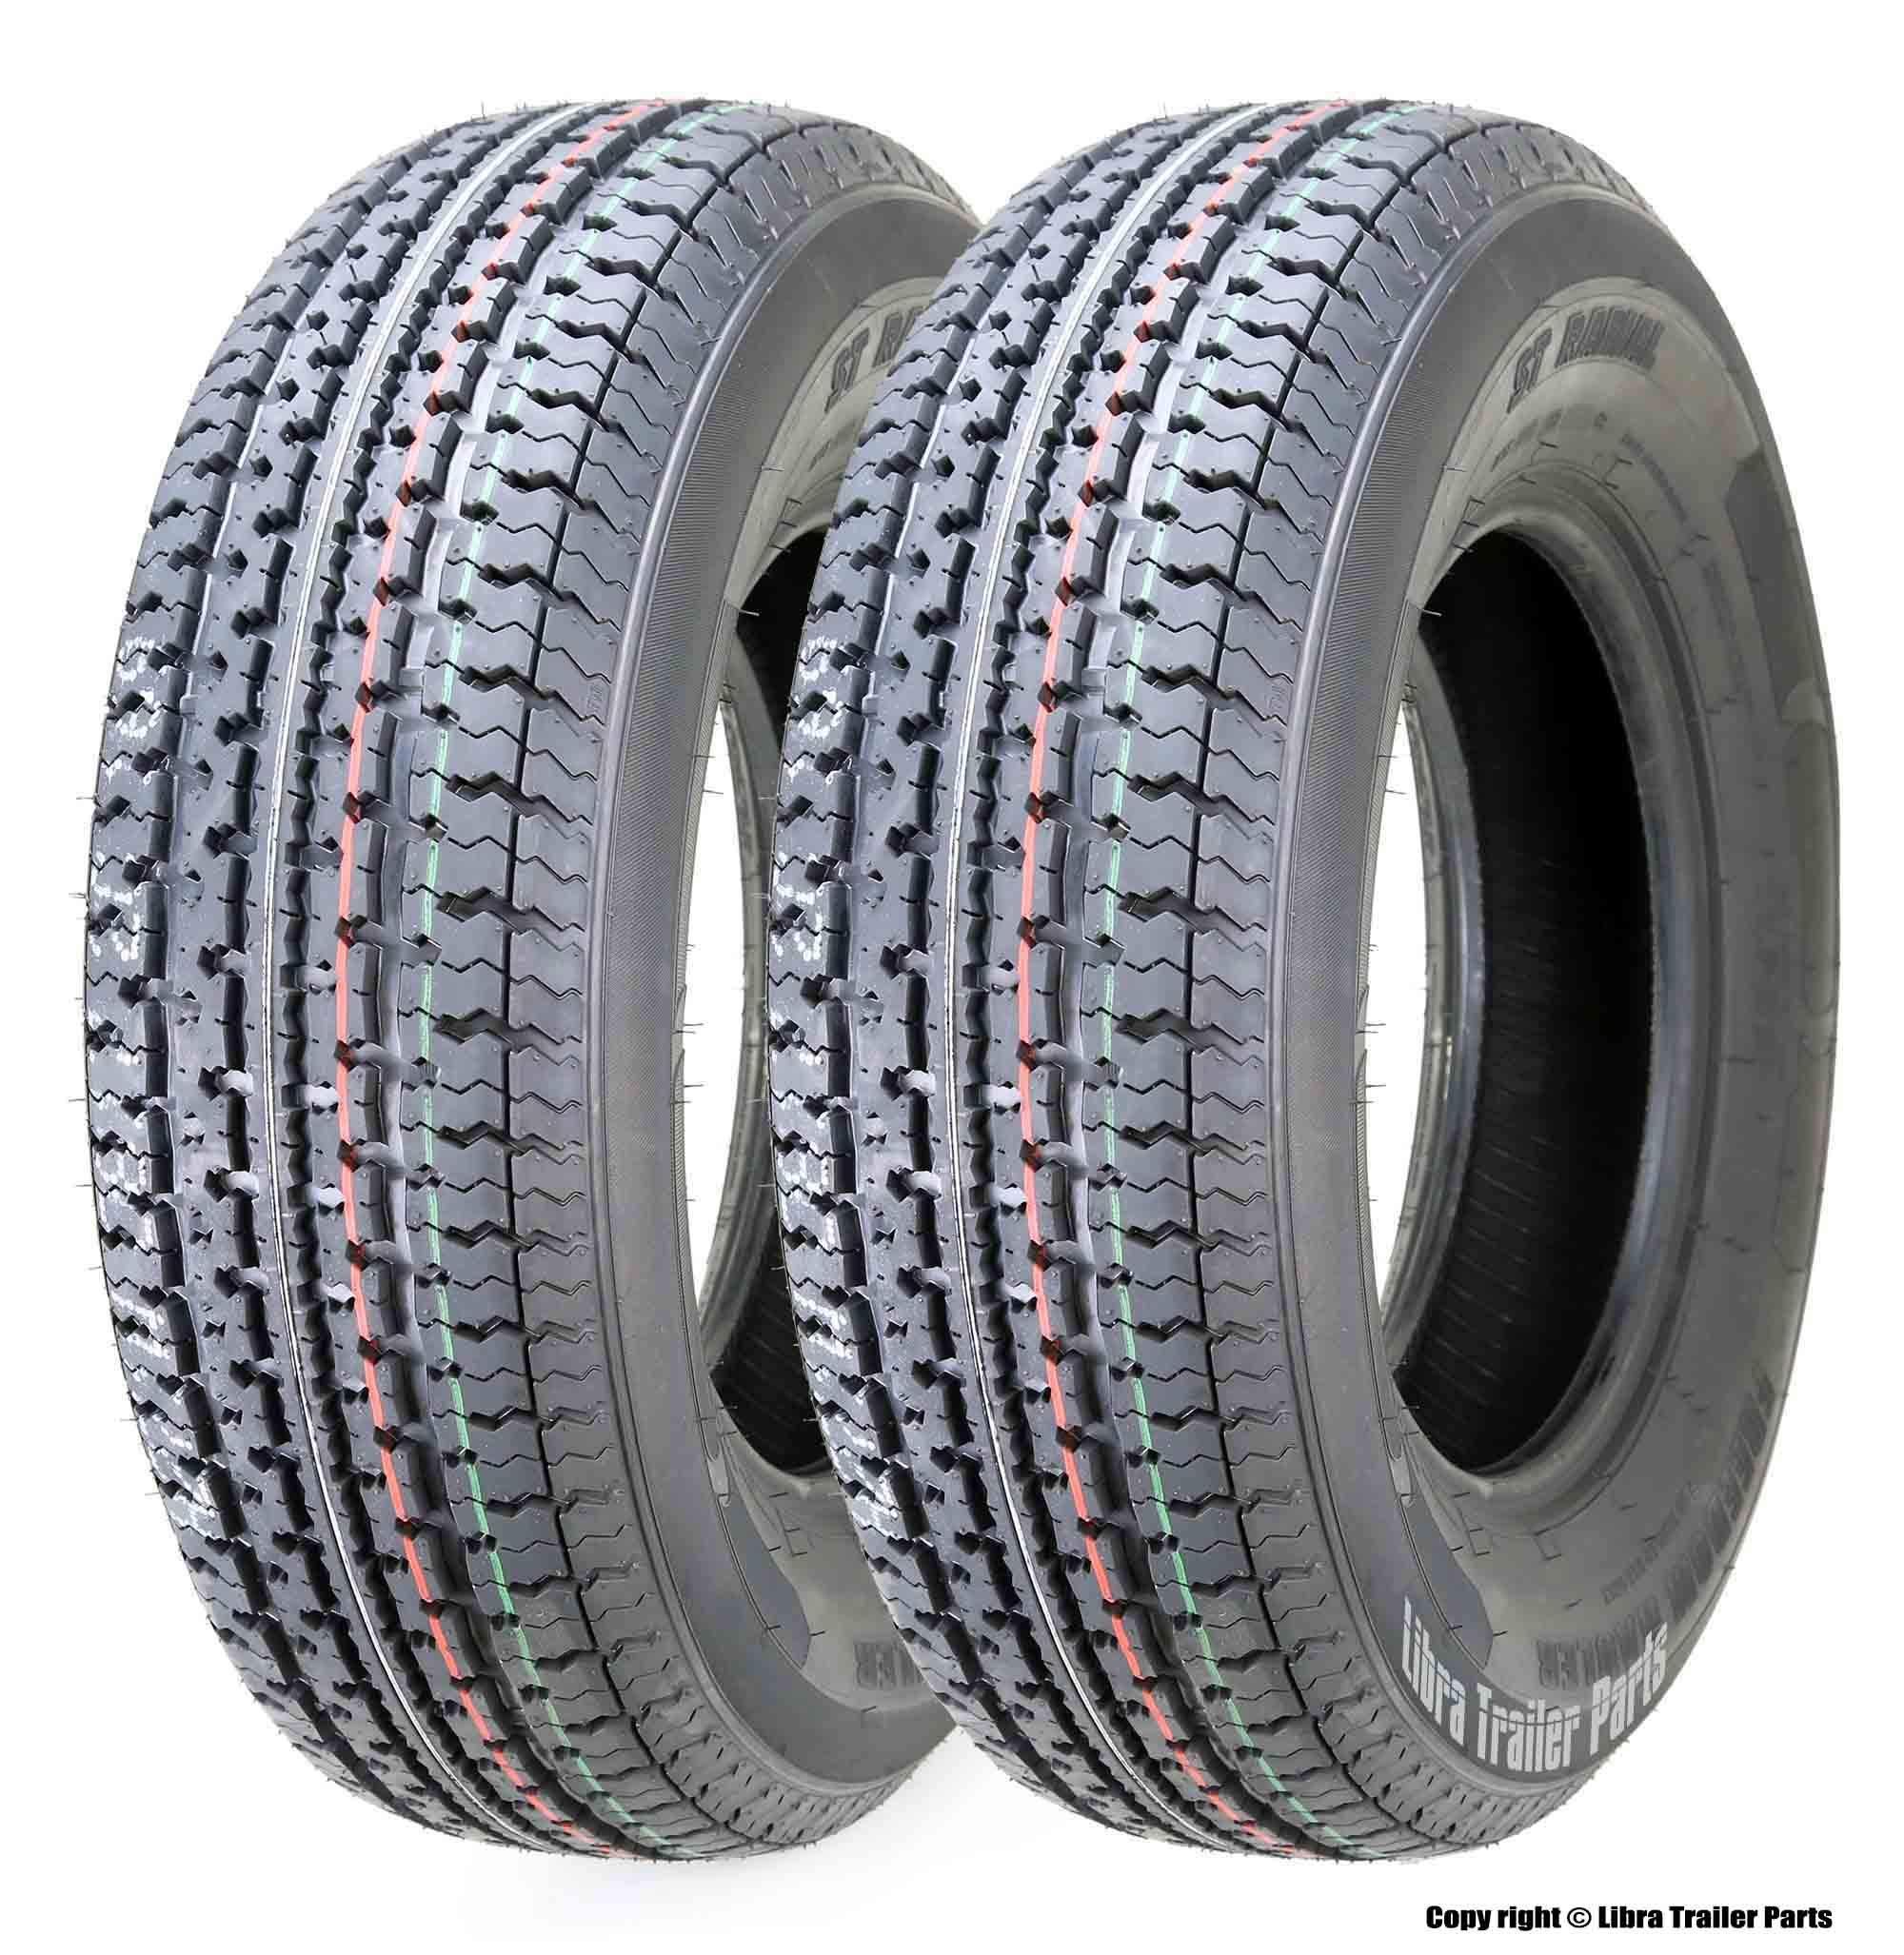 2 New Premium Freedom Hauler Trailer Tires ST 215/75R14 8PR Load Range D Steel Belted Radial by Grand Ride